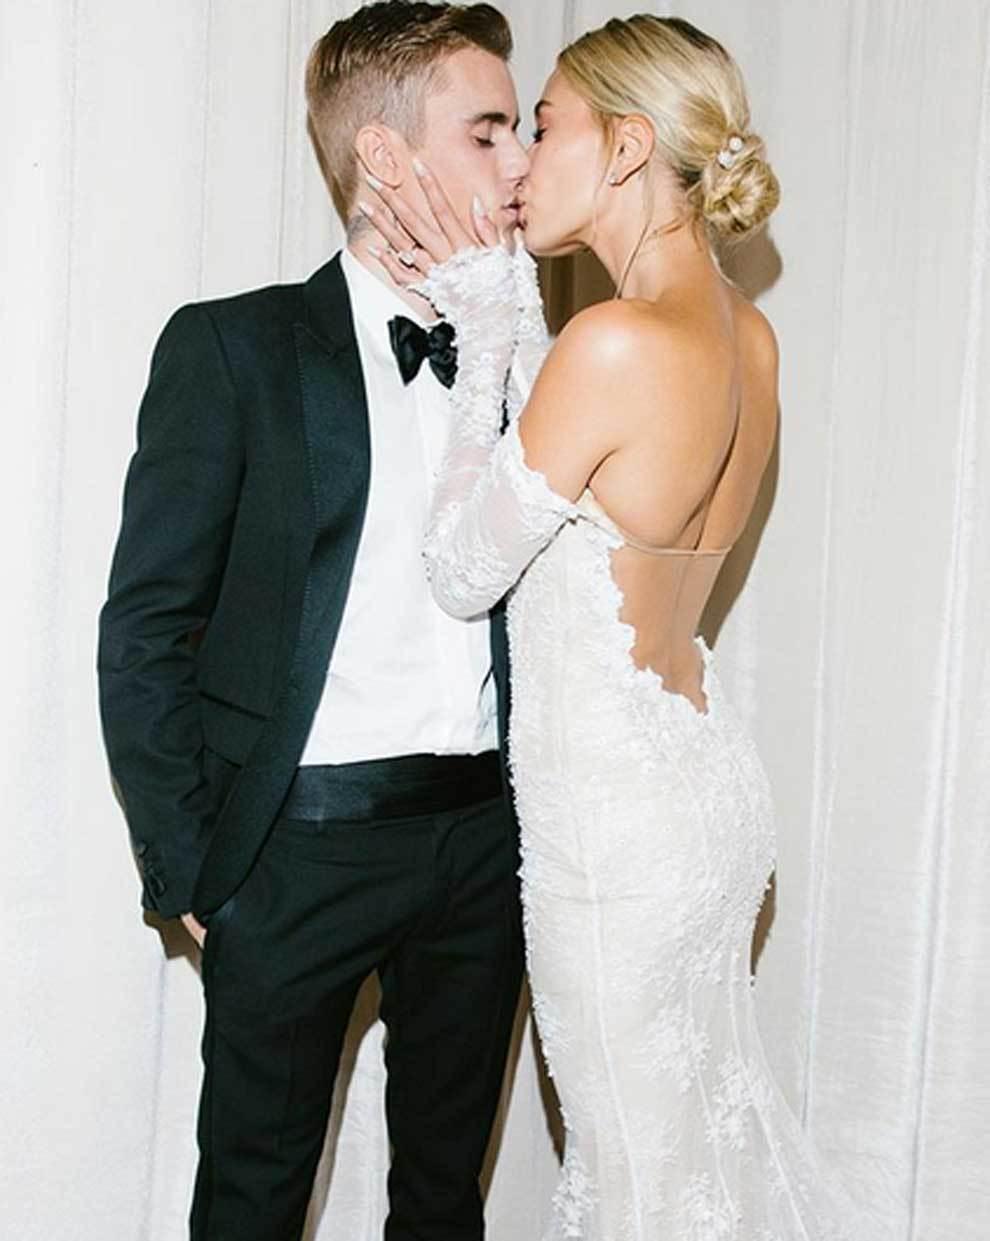 Boda del cantante Justin Bieber con la modelo Hailey Baldwin